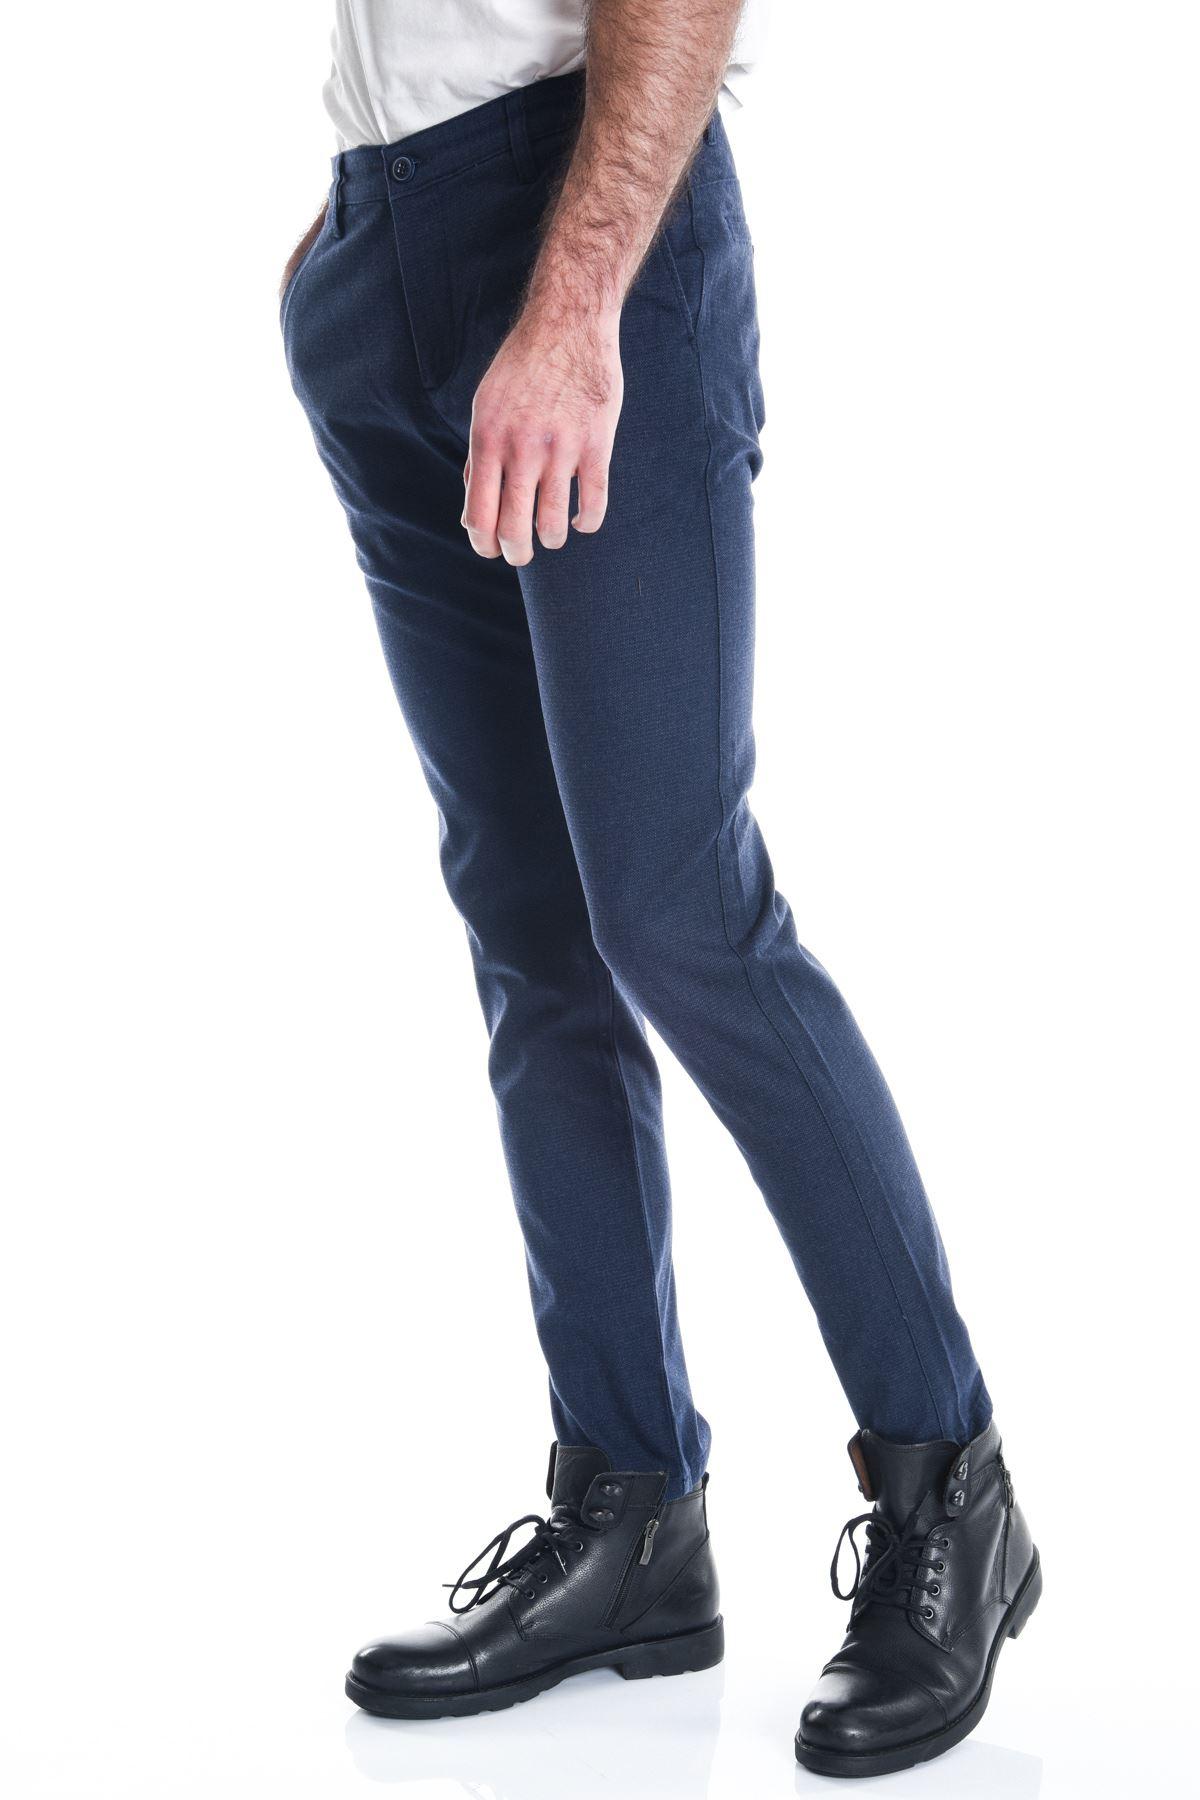 Açık Lacivert Slimfit Erkek Chino Pantolon